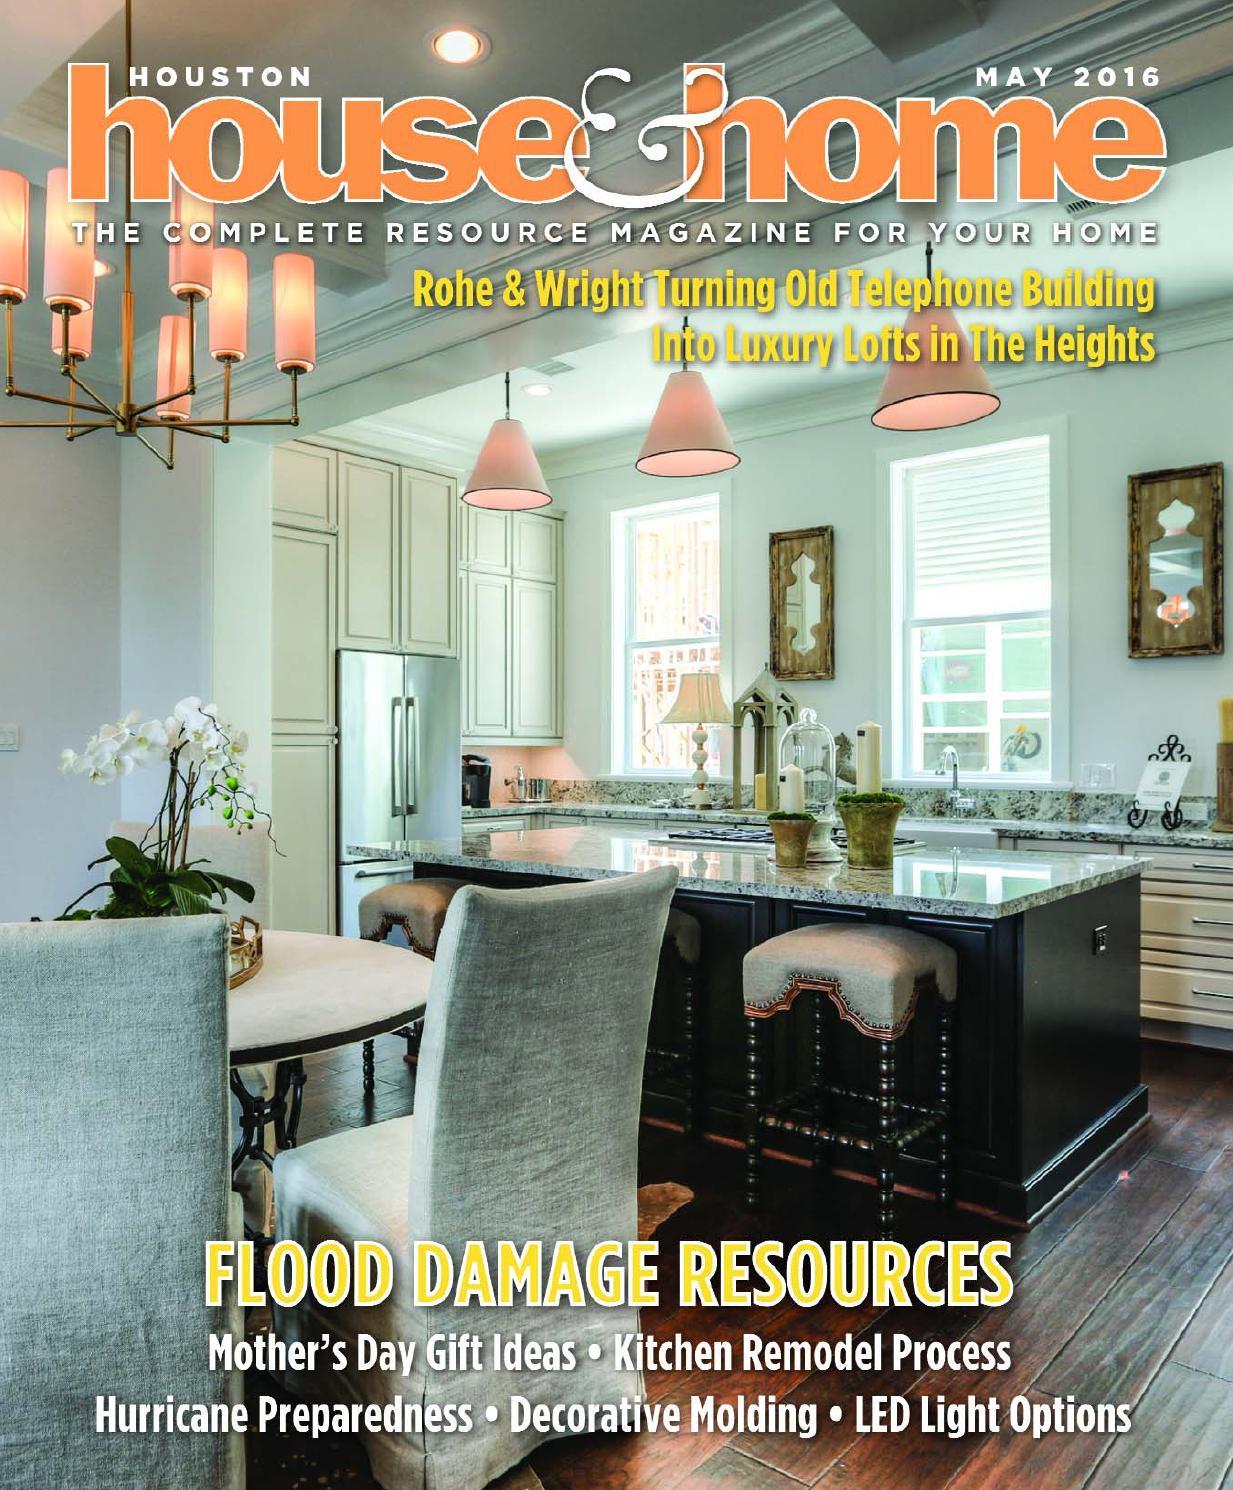 0516 Houhousehome Vir By Houston House & Home Magazine